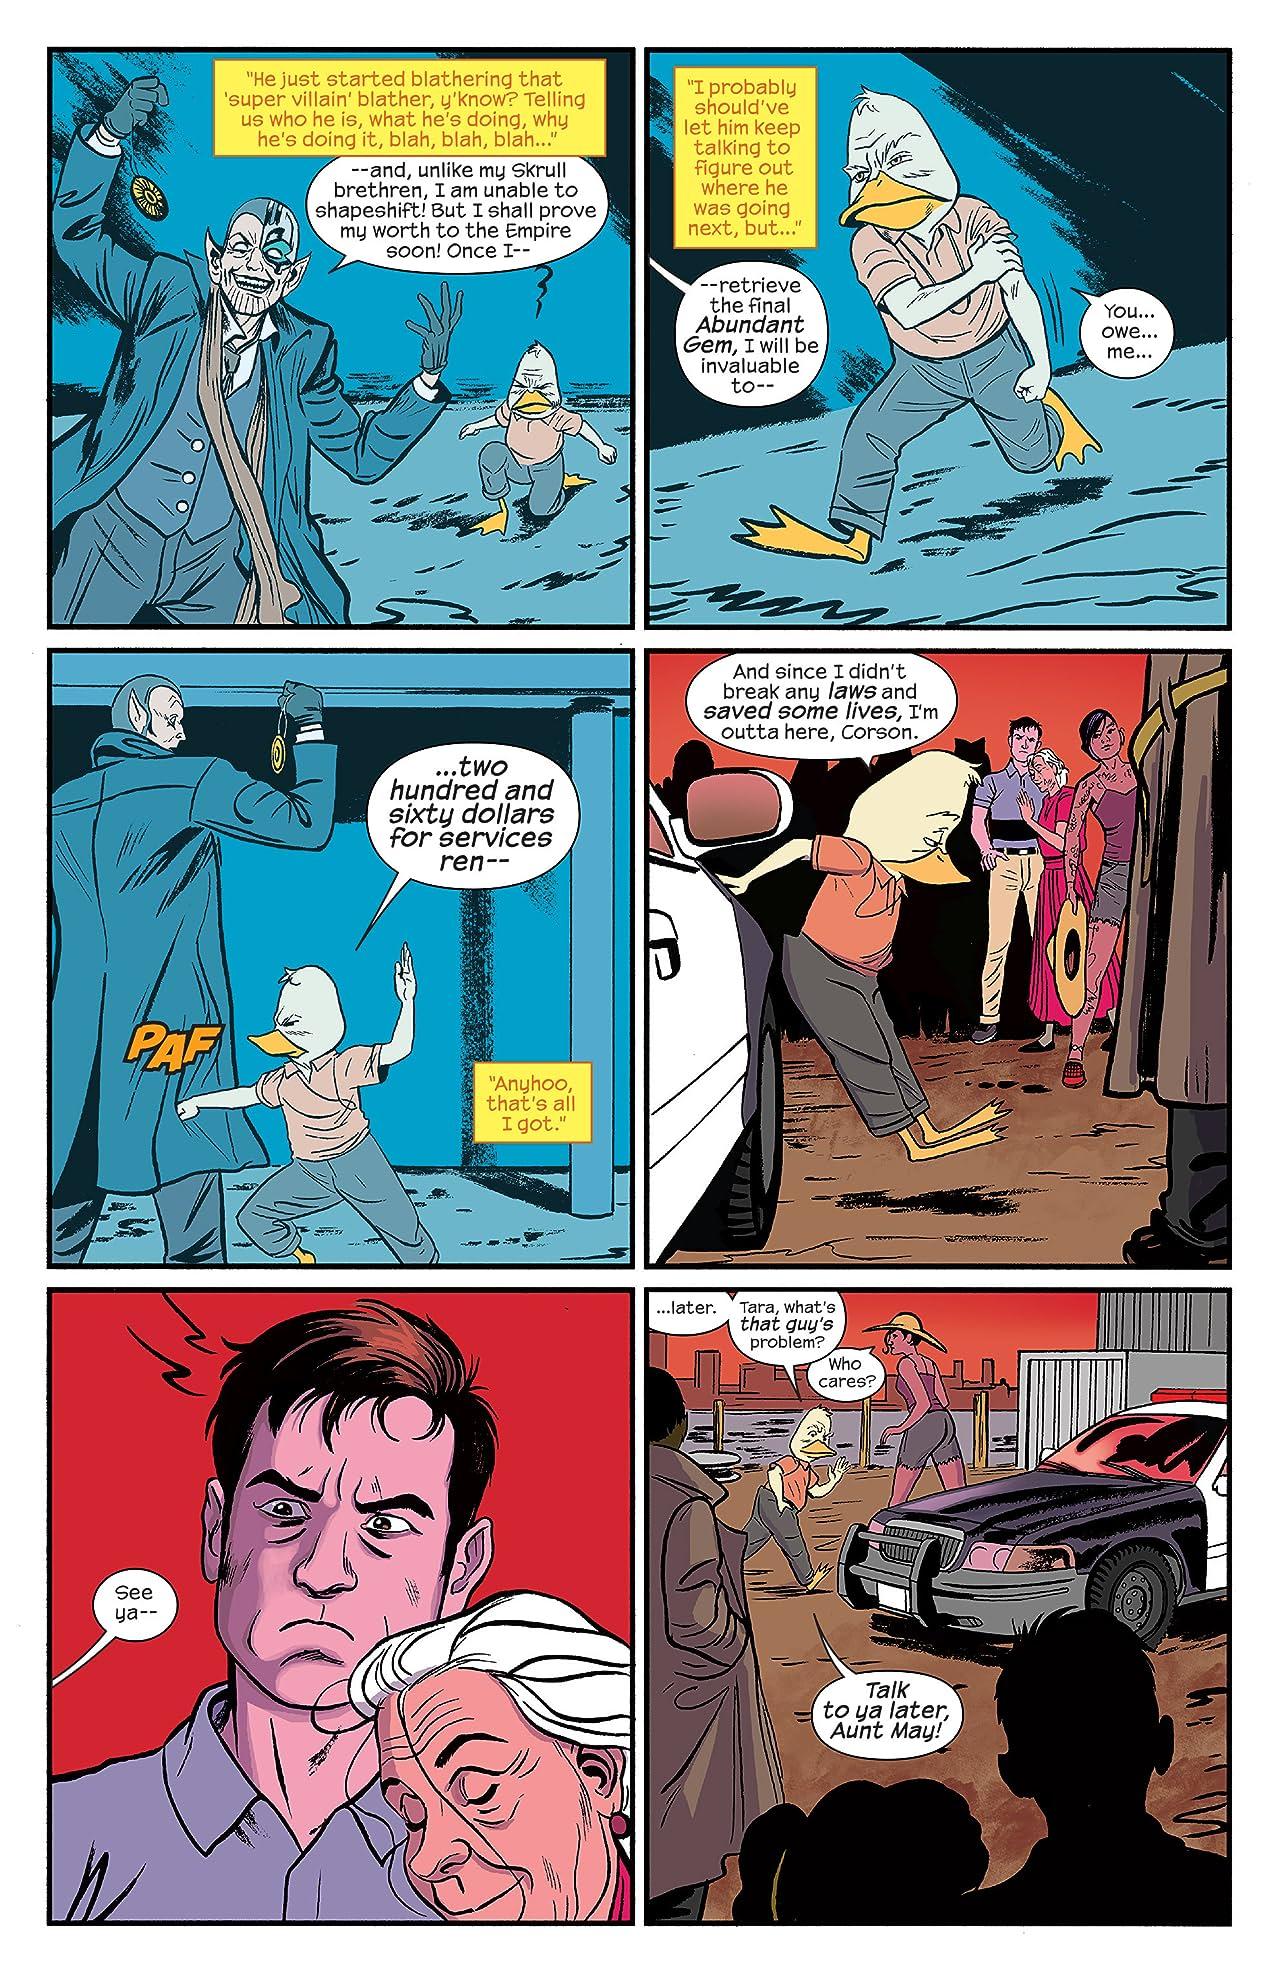 Howard The Duck (2015) #4